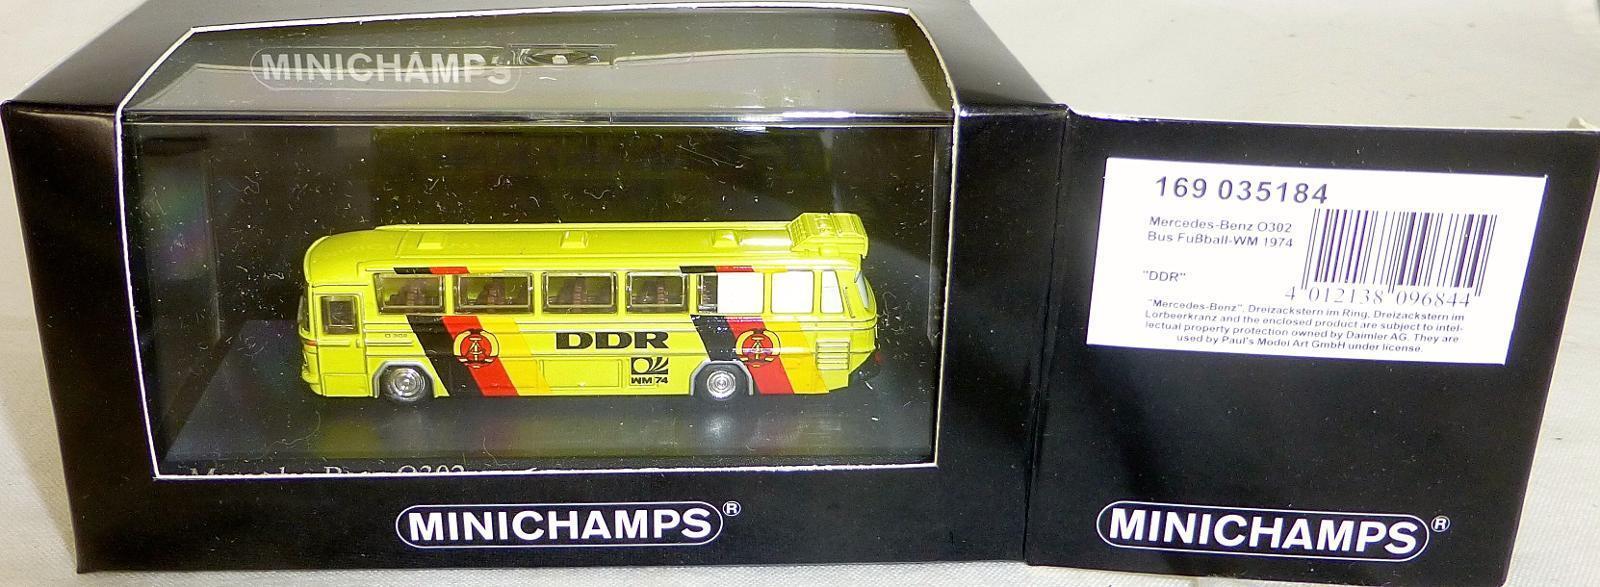 DDR Mondiali di Calcio 1974 Mercedes-Benz O302 Minichamps 1 160 Conf. Orig.  Lb5